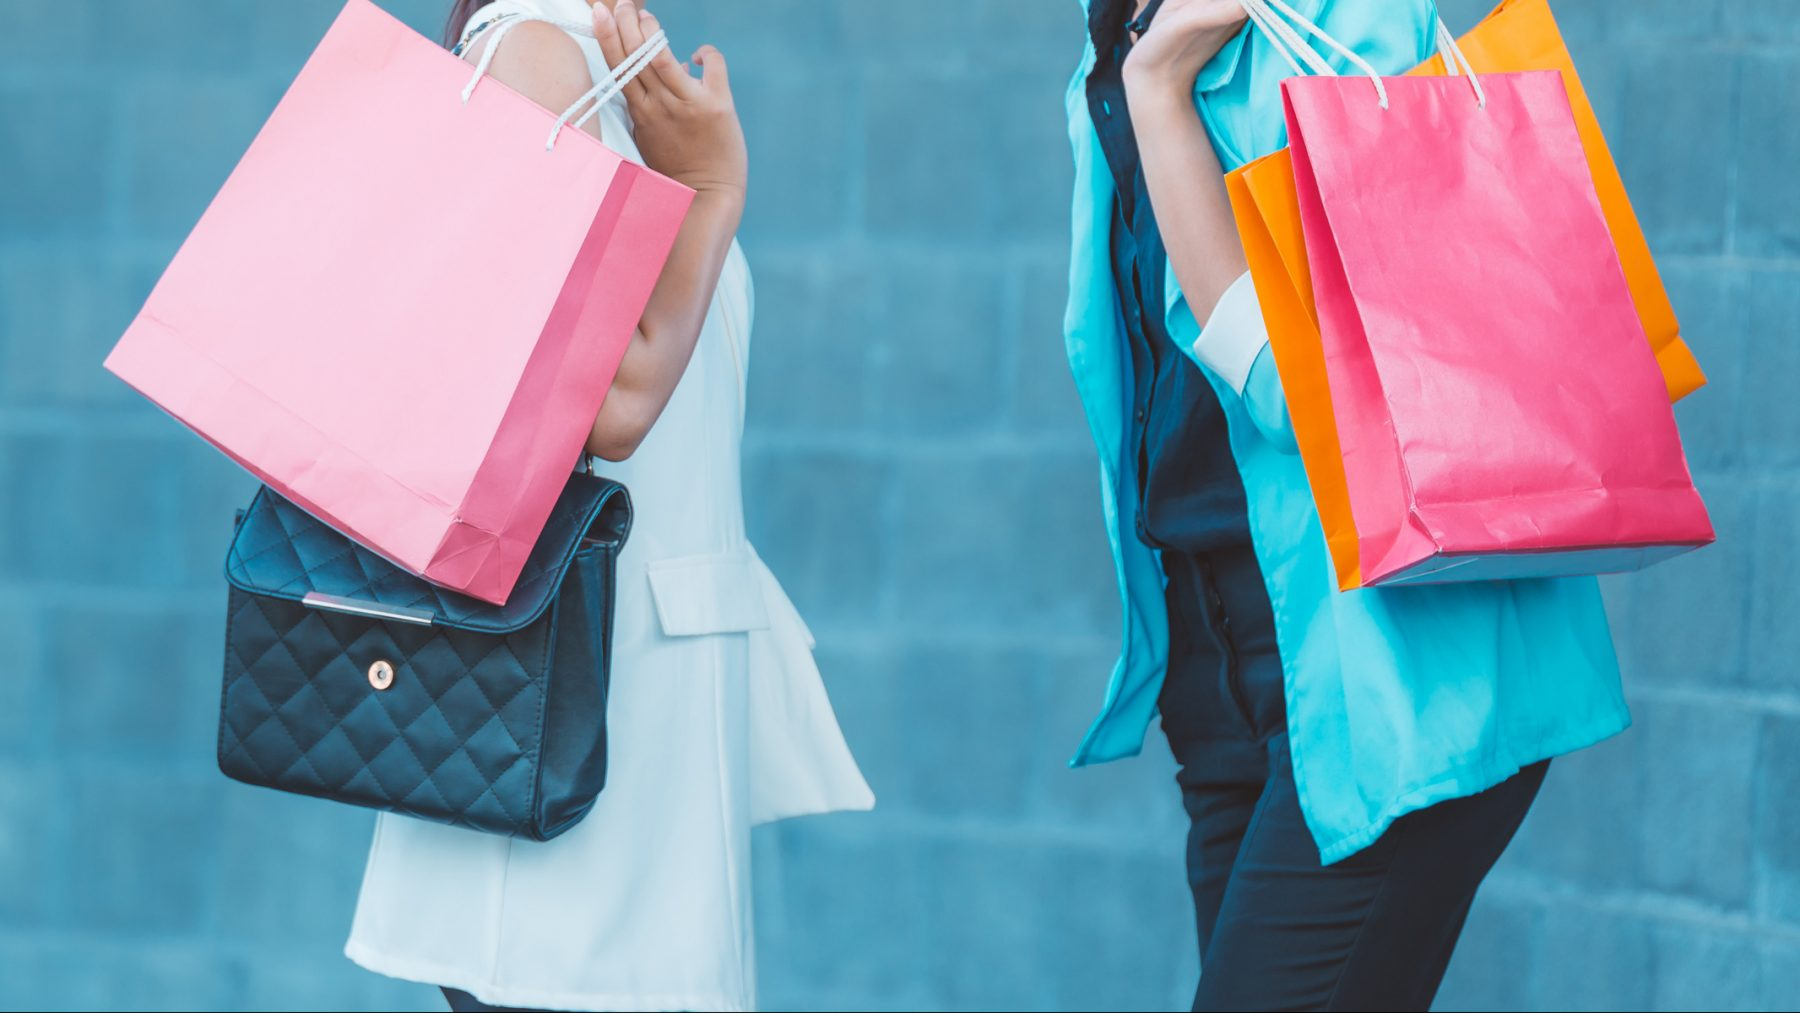 shoppen (Getty Images) Linda.mode shopavond Bijenkorf